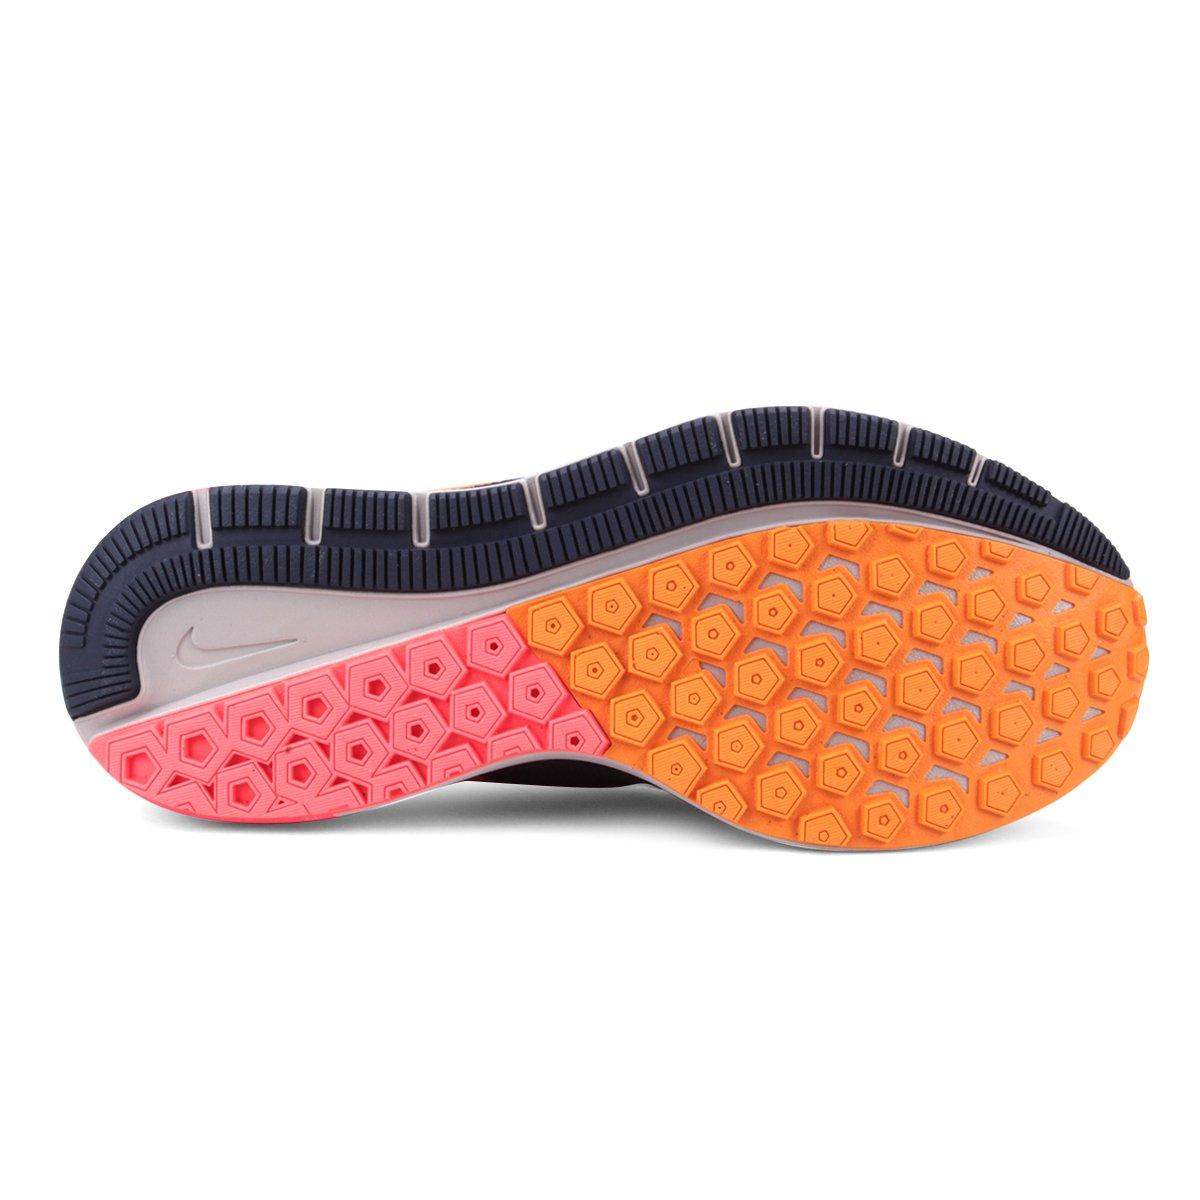 af14b967b7 Tênis Nike Air Zoom Structure 22 Masculino - Azul e Laranja - Compre ...